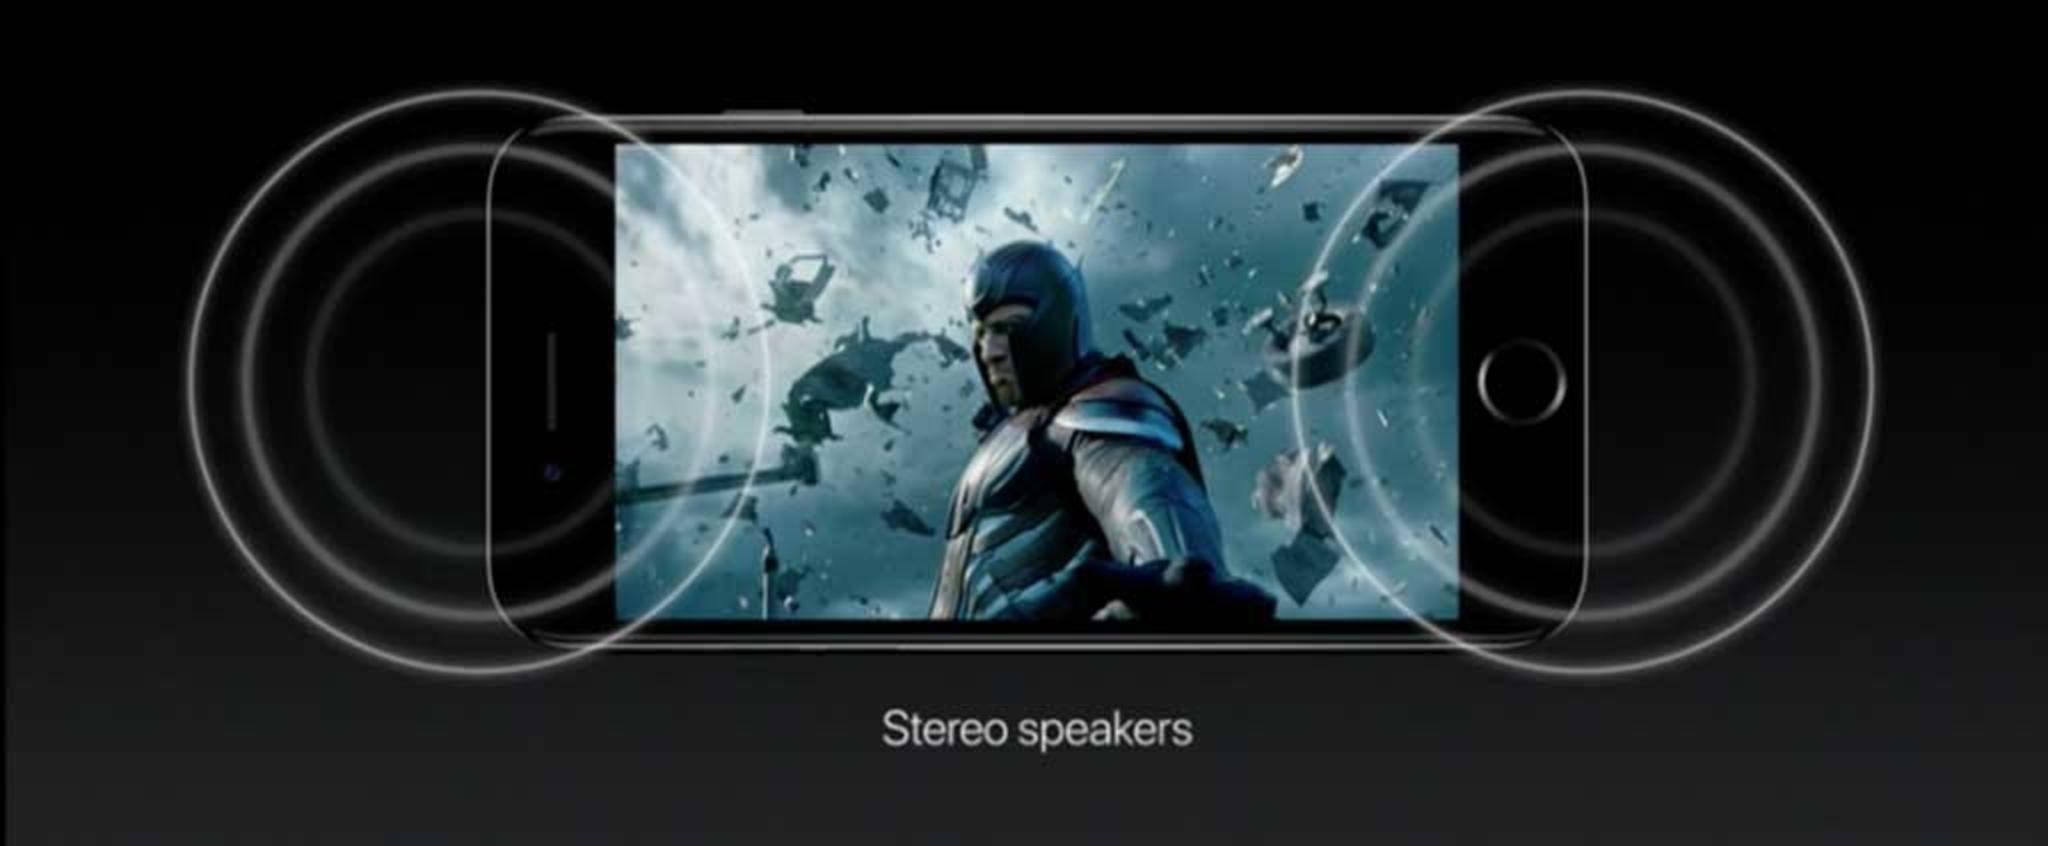 iphone7-stereo.jpg